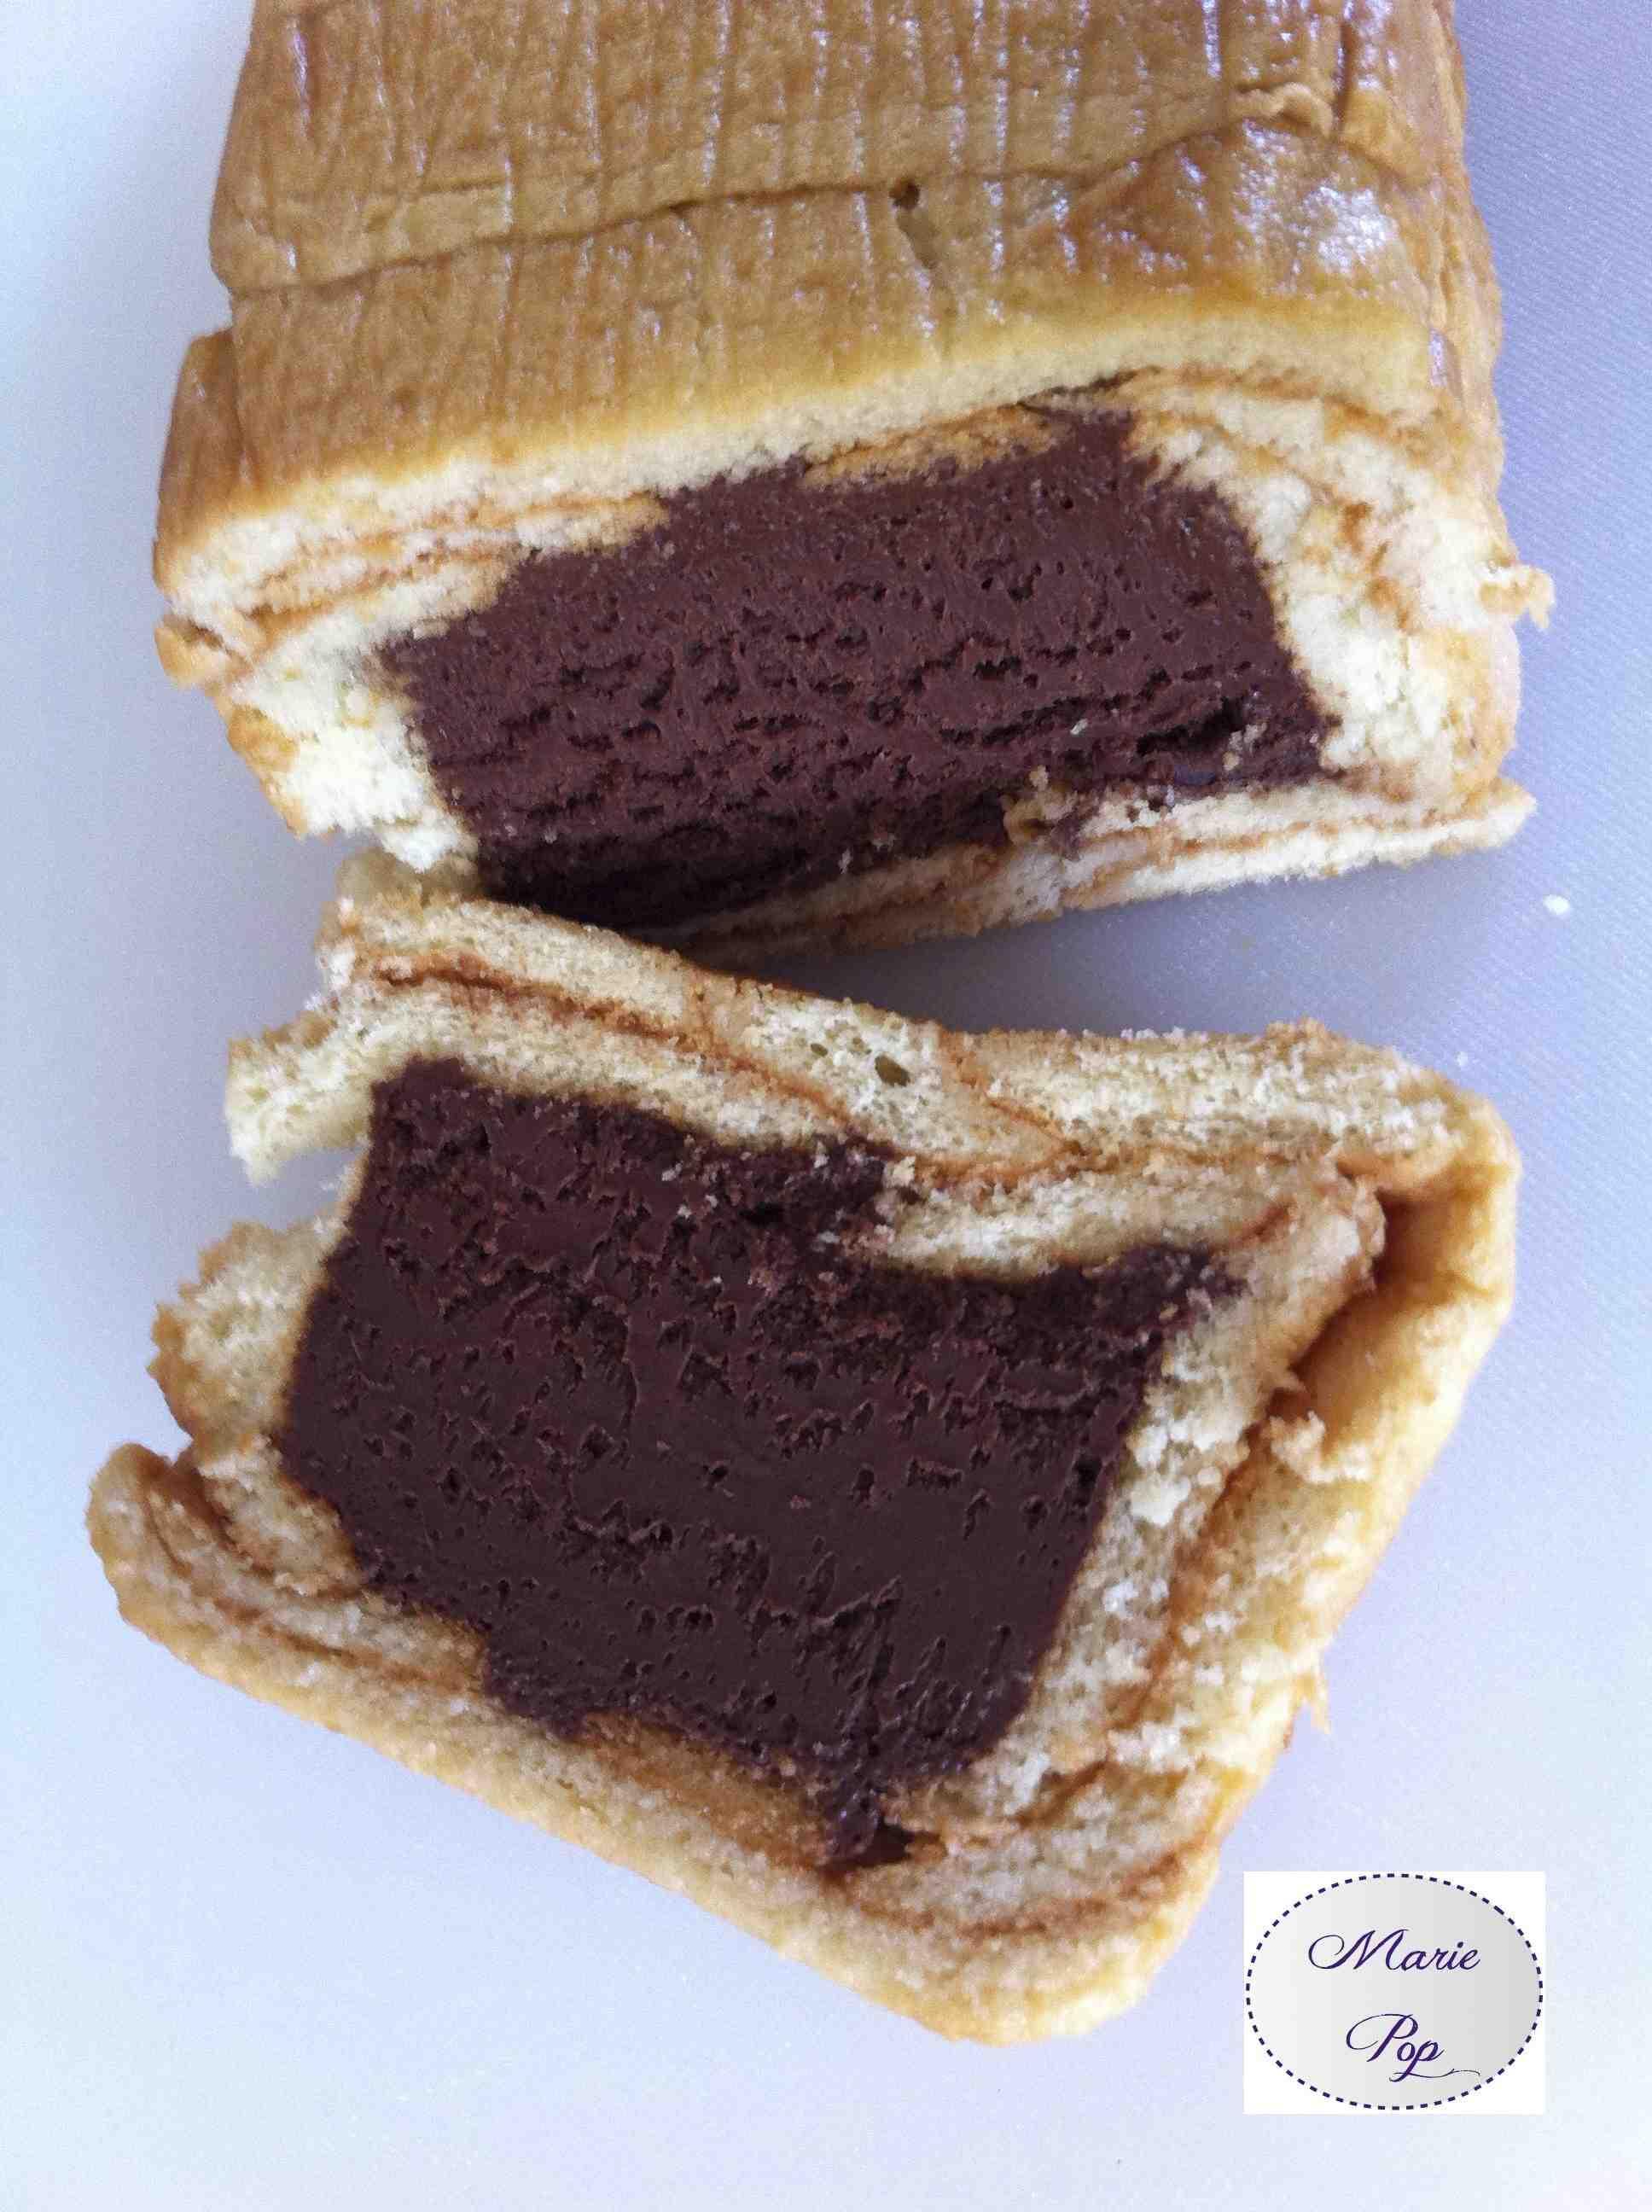 Cakelotte au chocolat comme une marquise